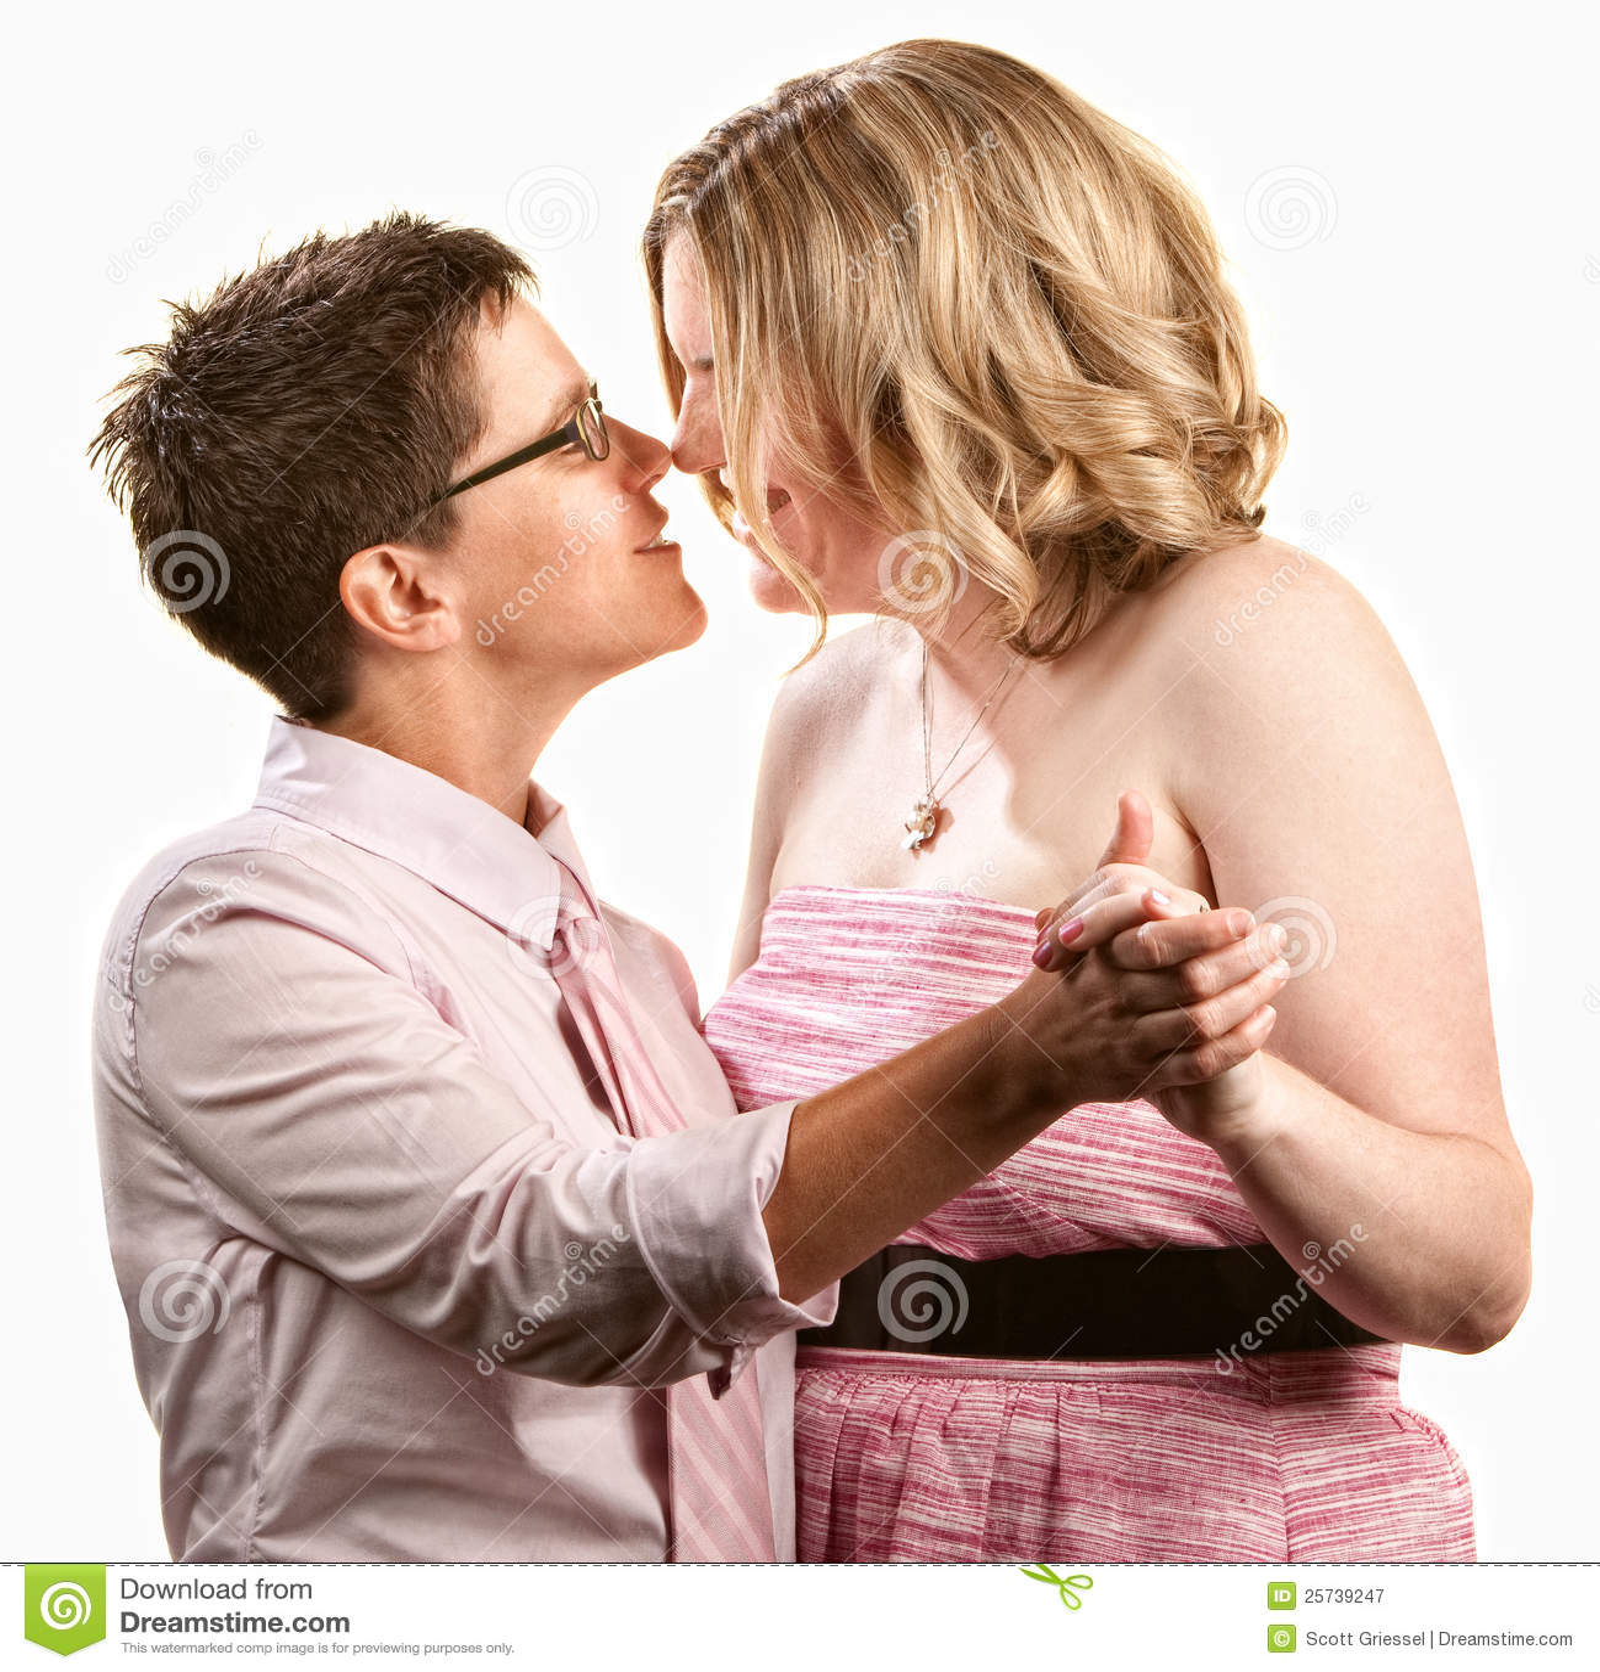 https://thumbs.dreamstime.com/z/baile-lesbiano-de-los-pares-25739247.jpg